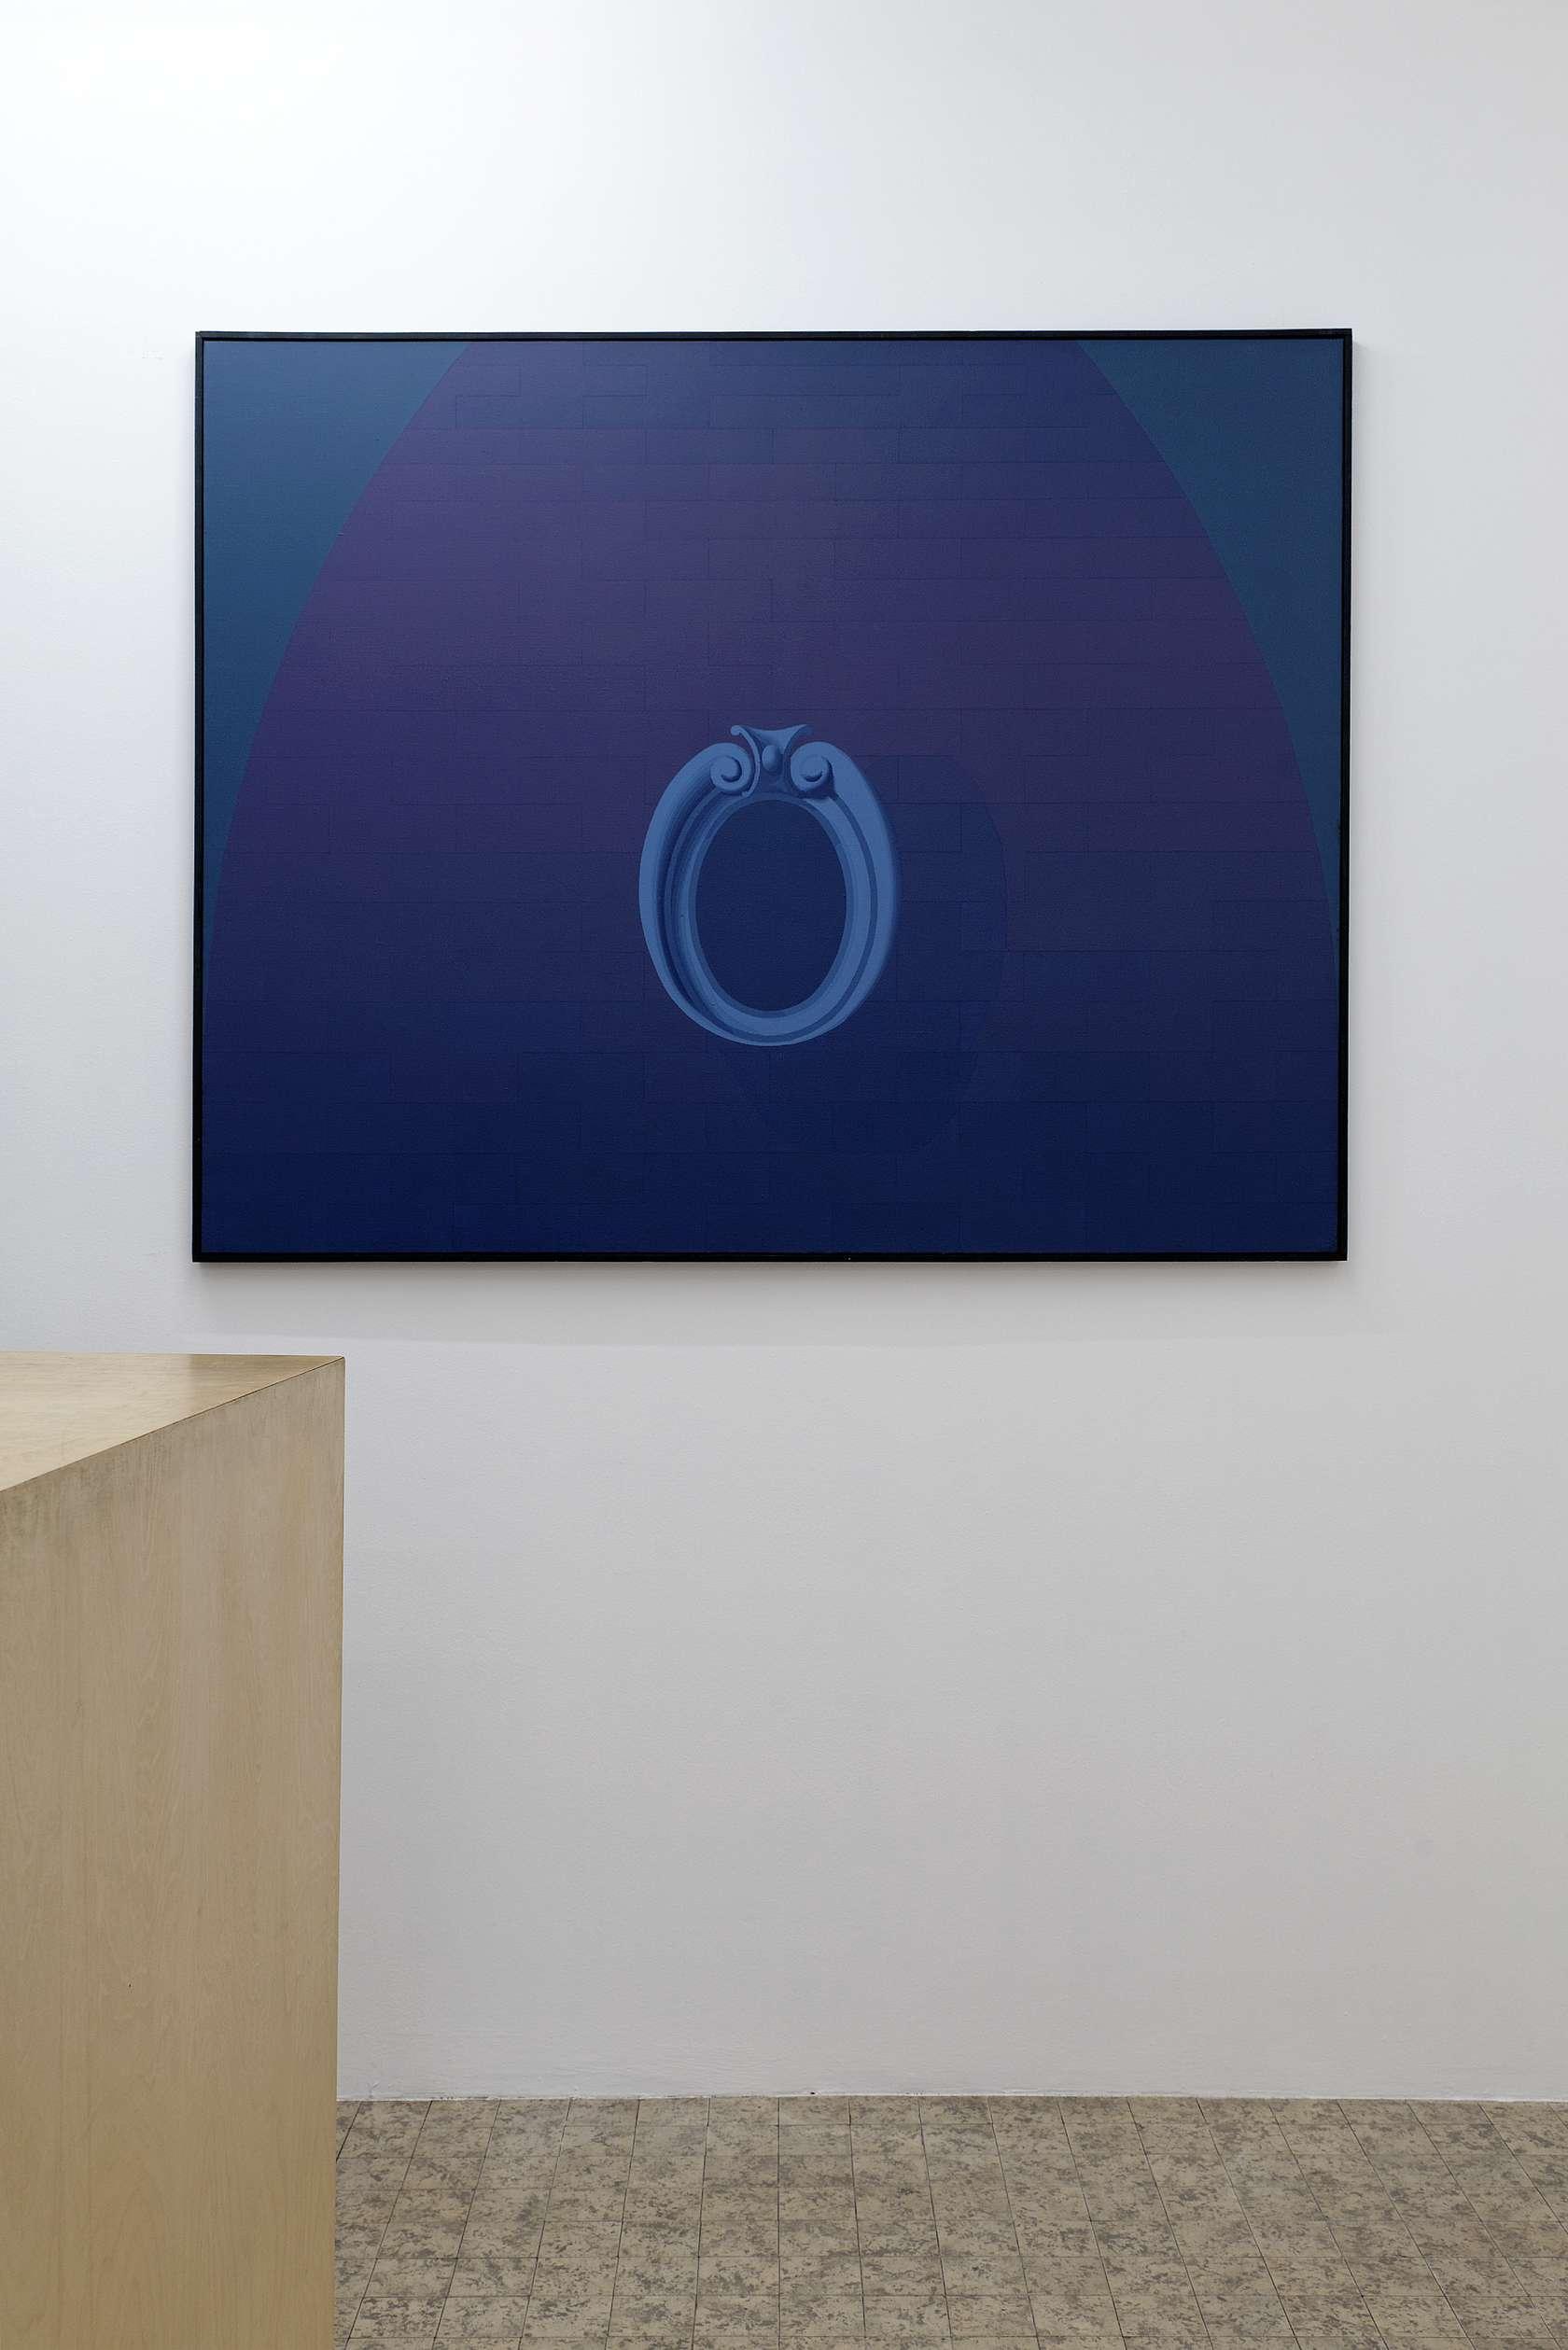 Christian Babou, Christian Babou curated by Mathieu Mercier 27 mars  — 17 mai 2014